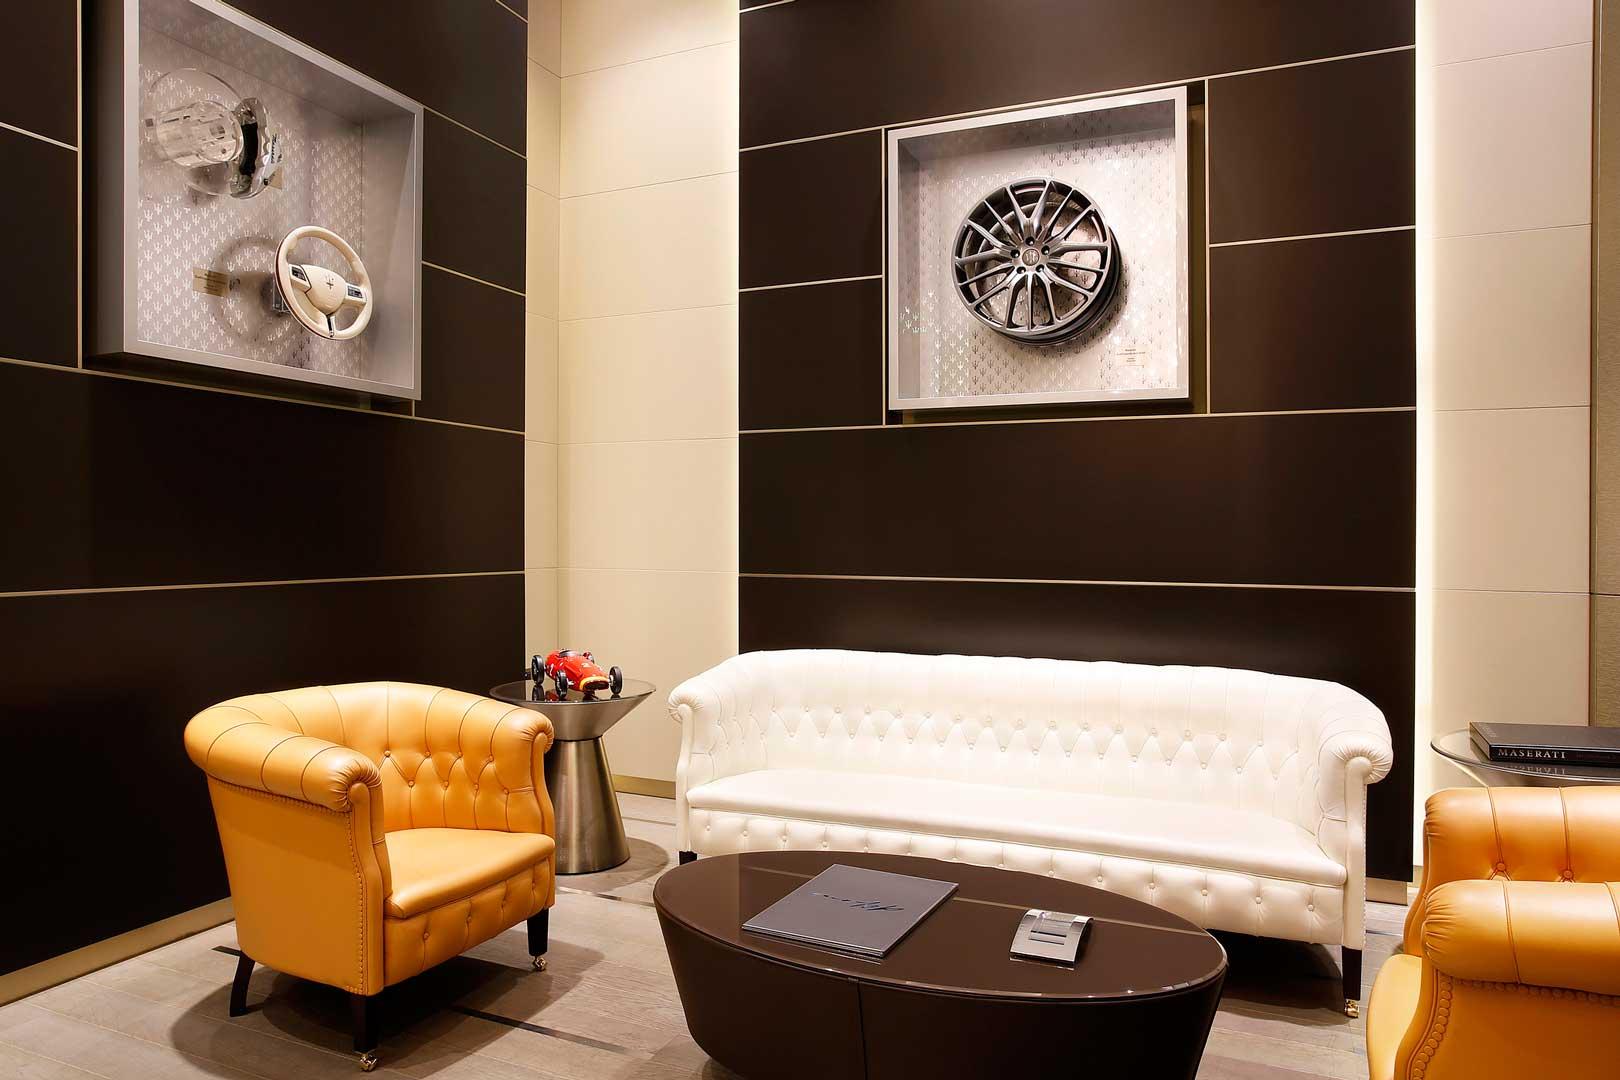 Excelsior Hotel Gallia | Cigar Room